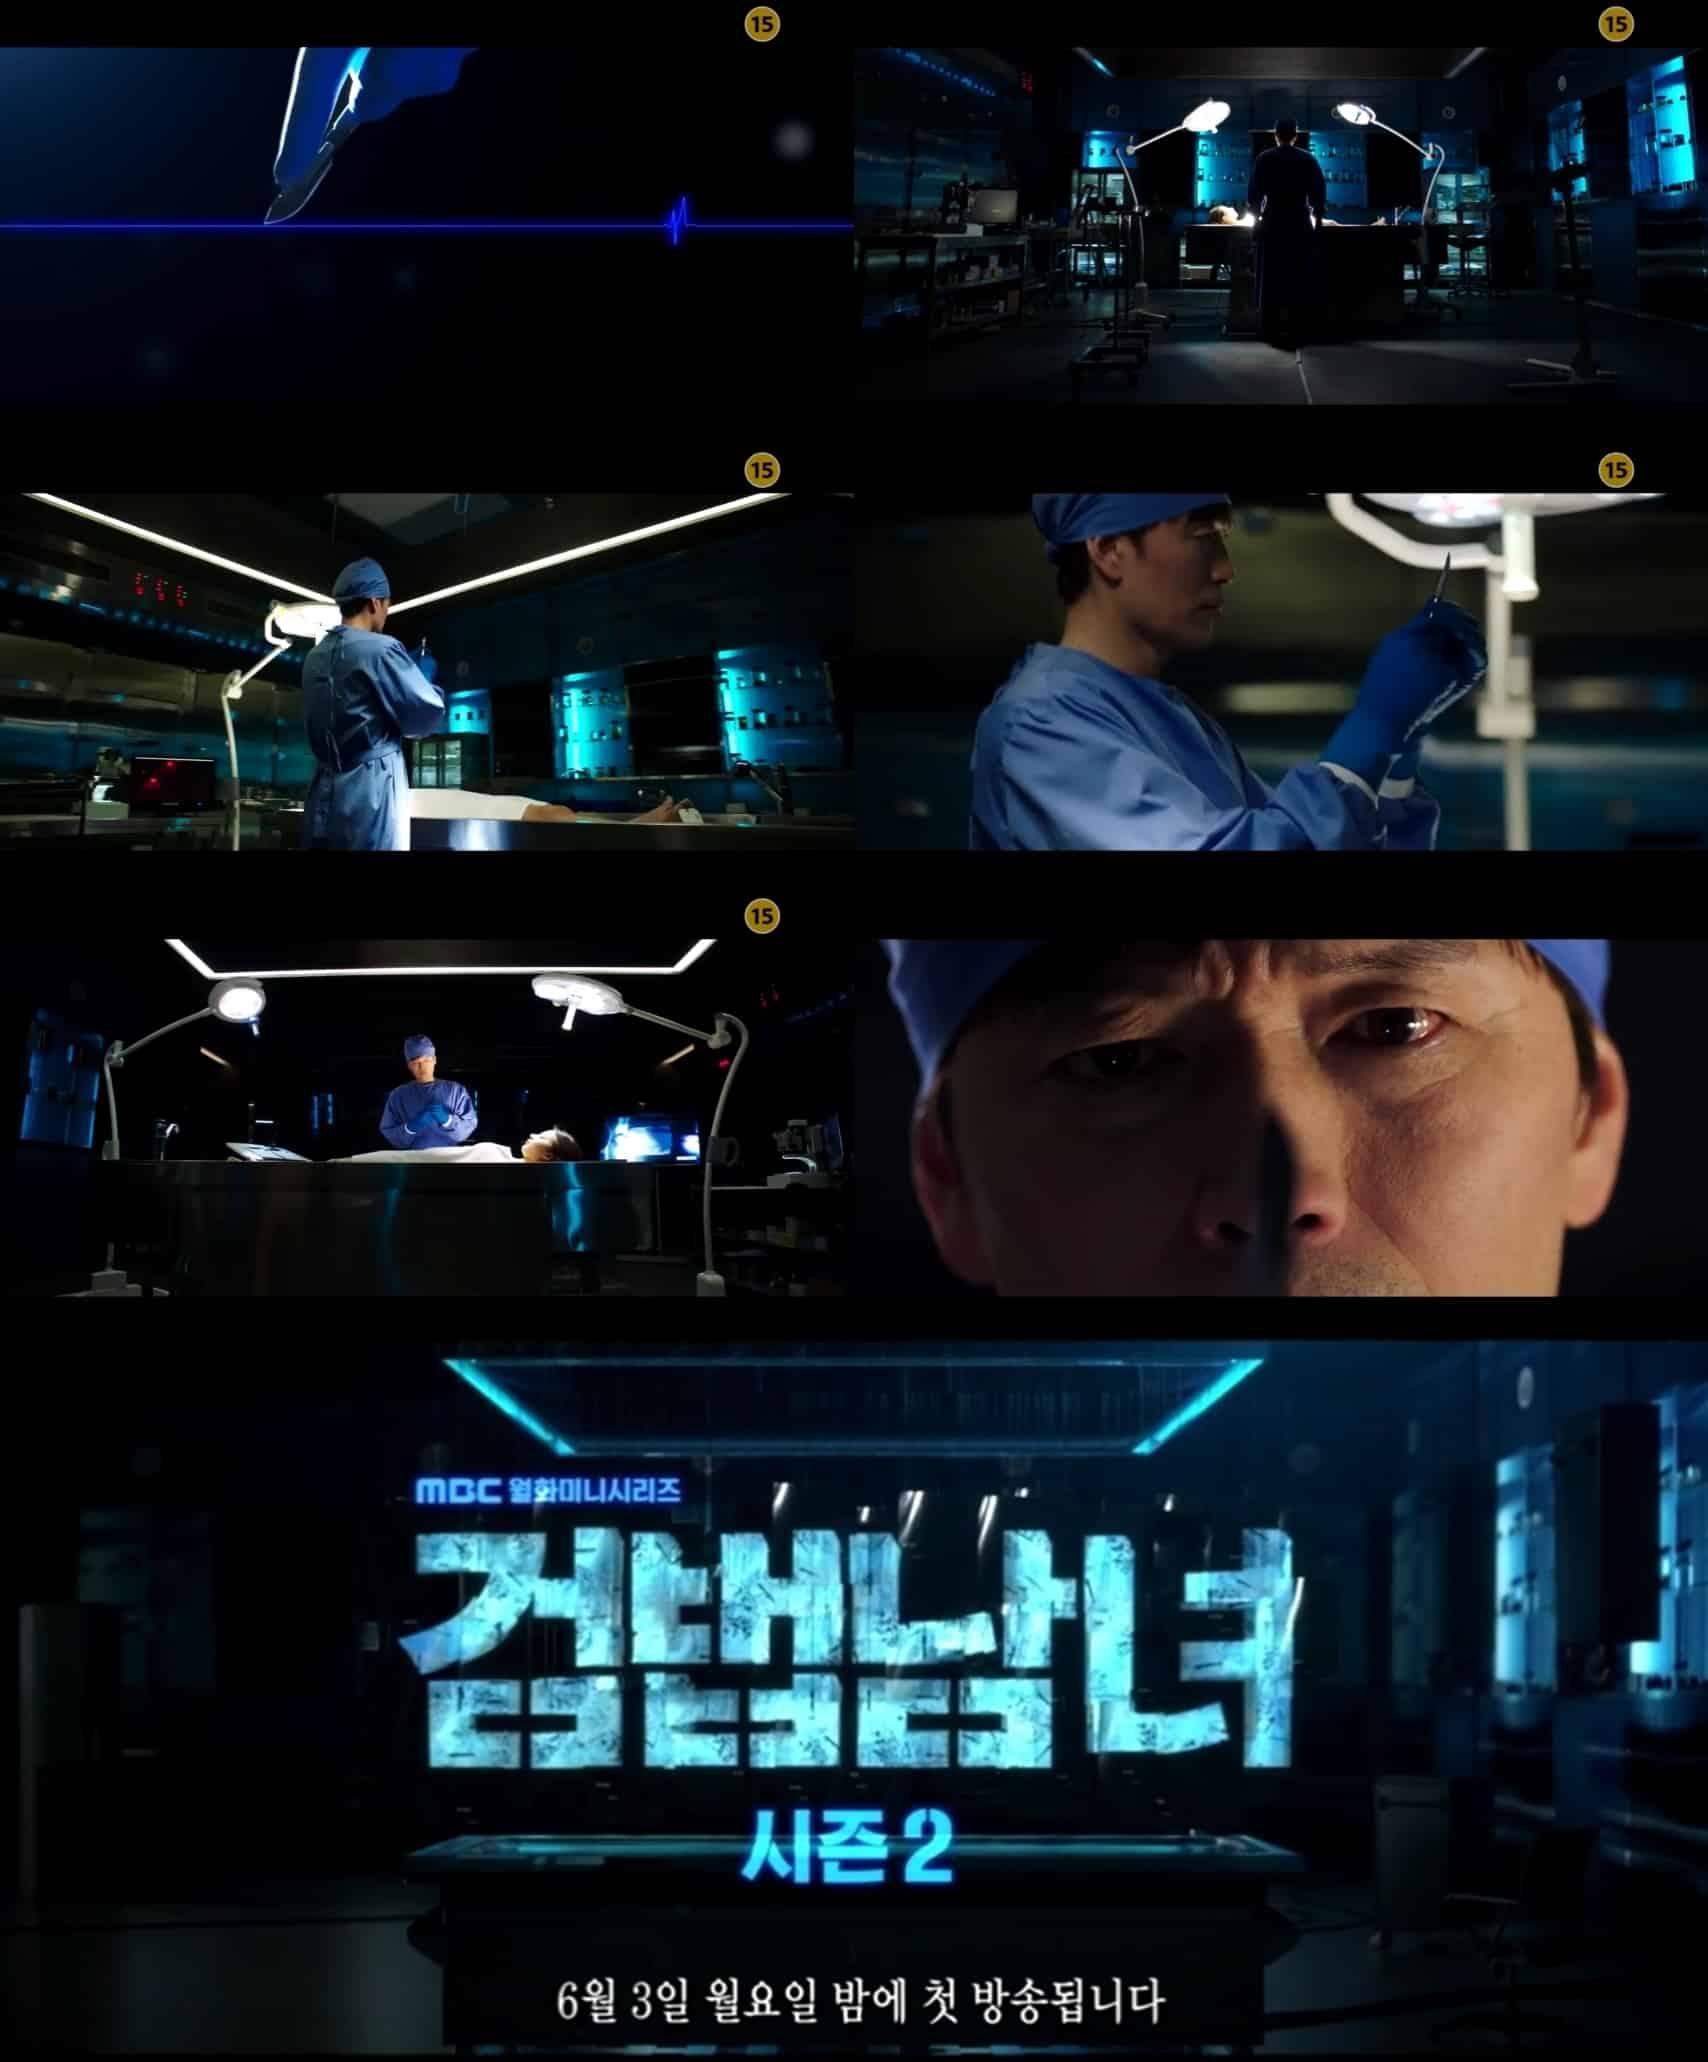 Partners for Justice Season 2 ศพ ซ่อน ปม ปี 2 พากย์ไทย EP1-EP16 [จบ]